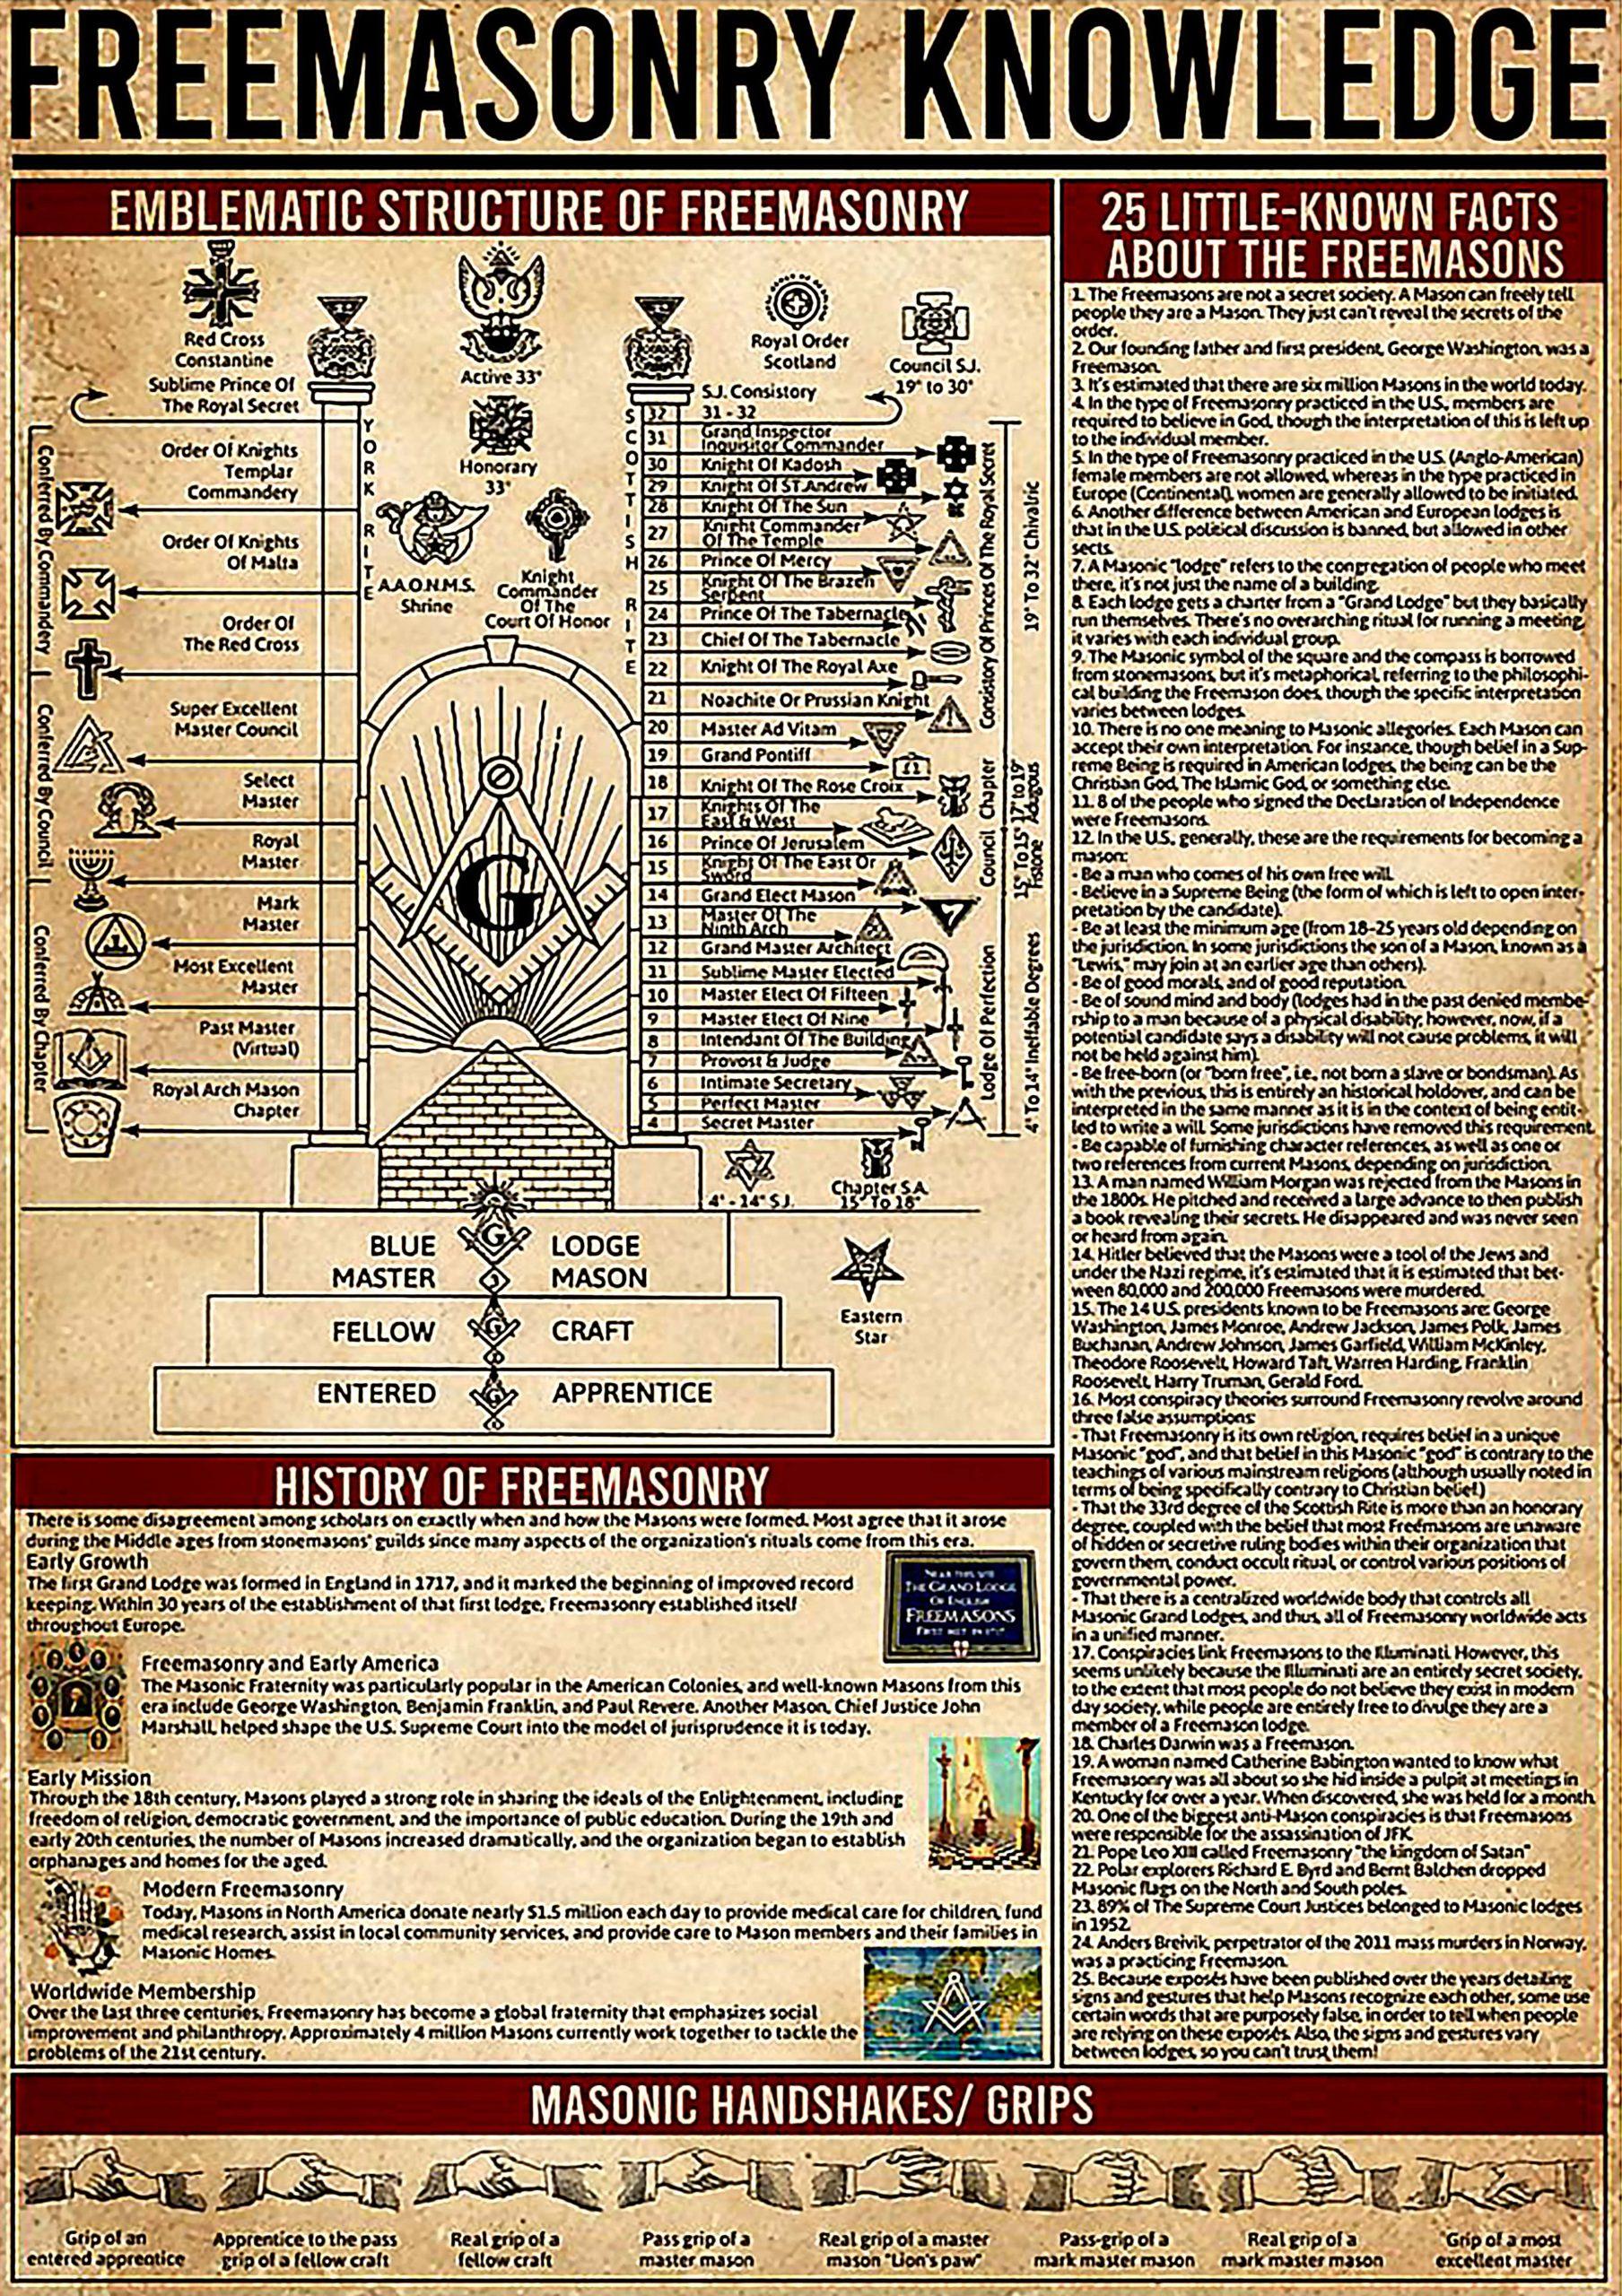 vintage freemasonry knowledge poster 1 - Copy